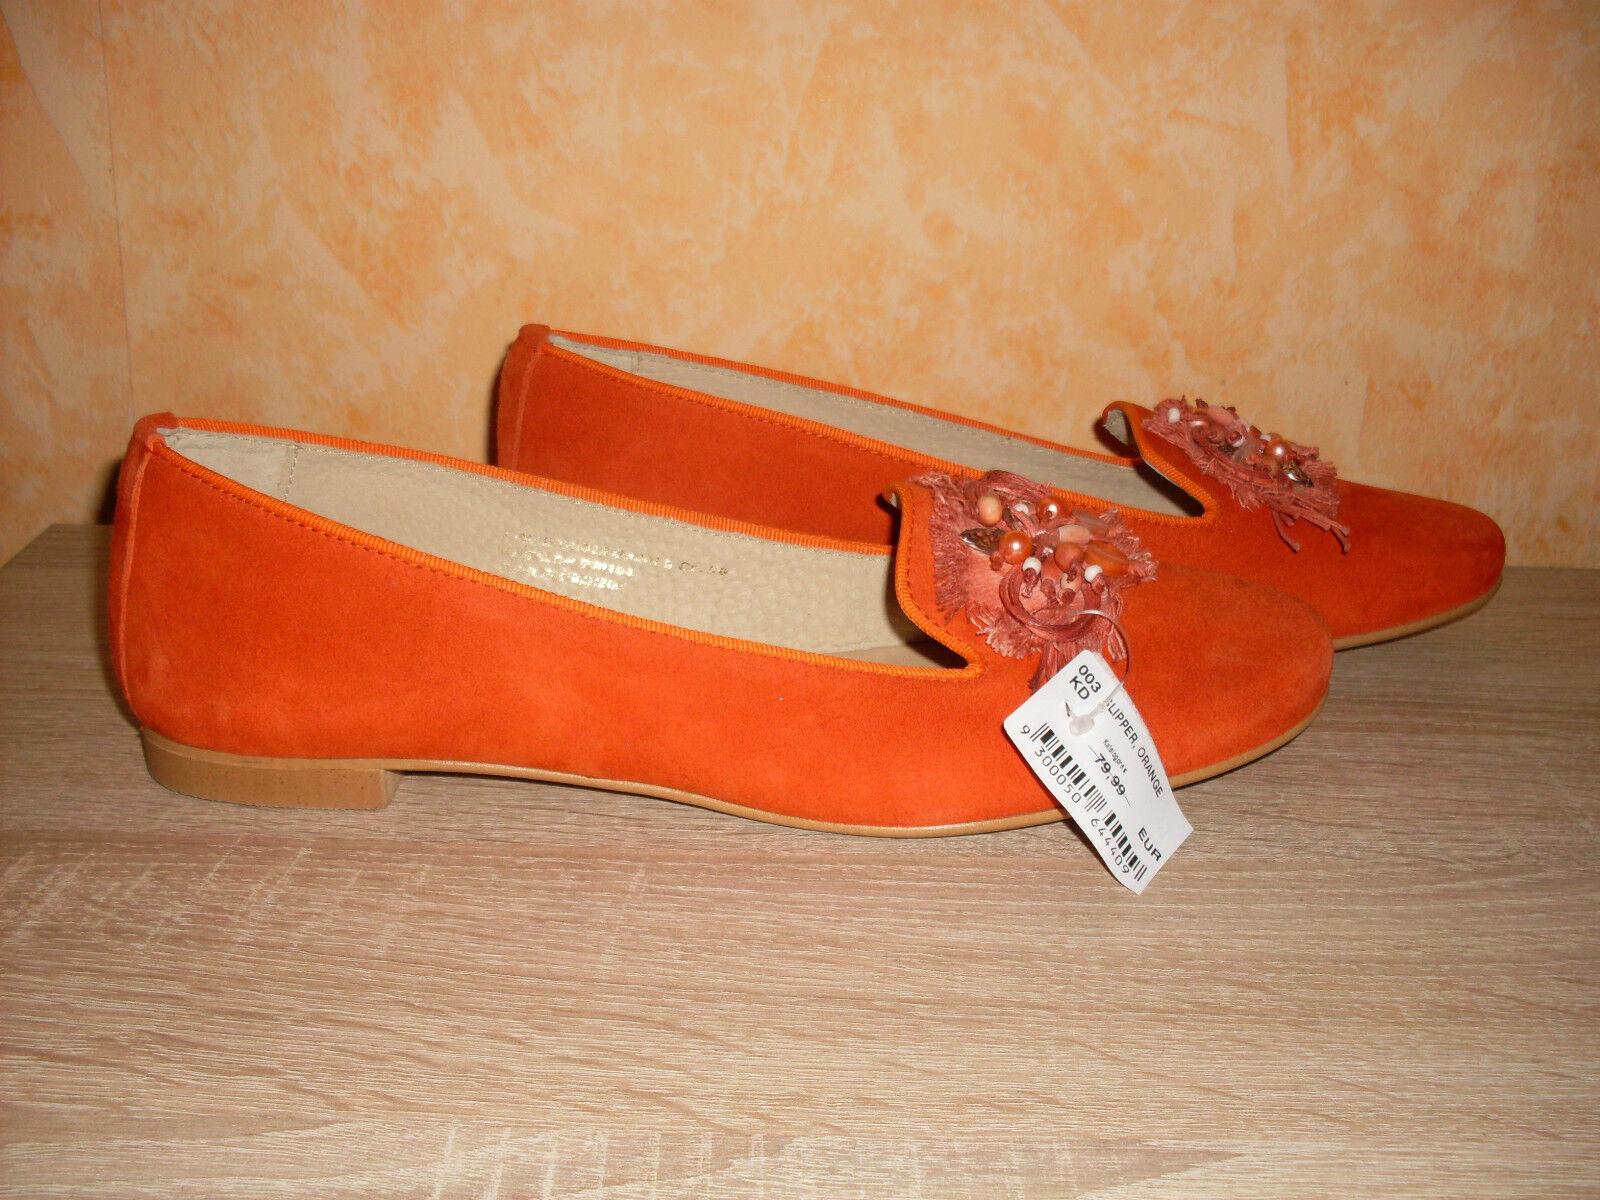 Studio W Slipper     Ballerina NEU Gr. 43 in orange & ganz weiches Leder super abcb1f